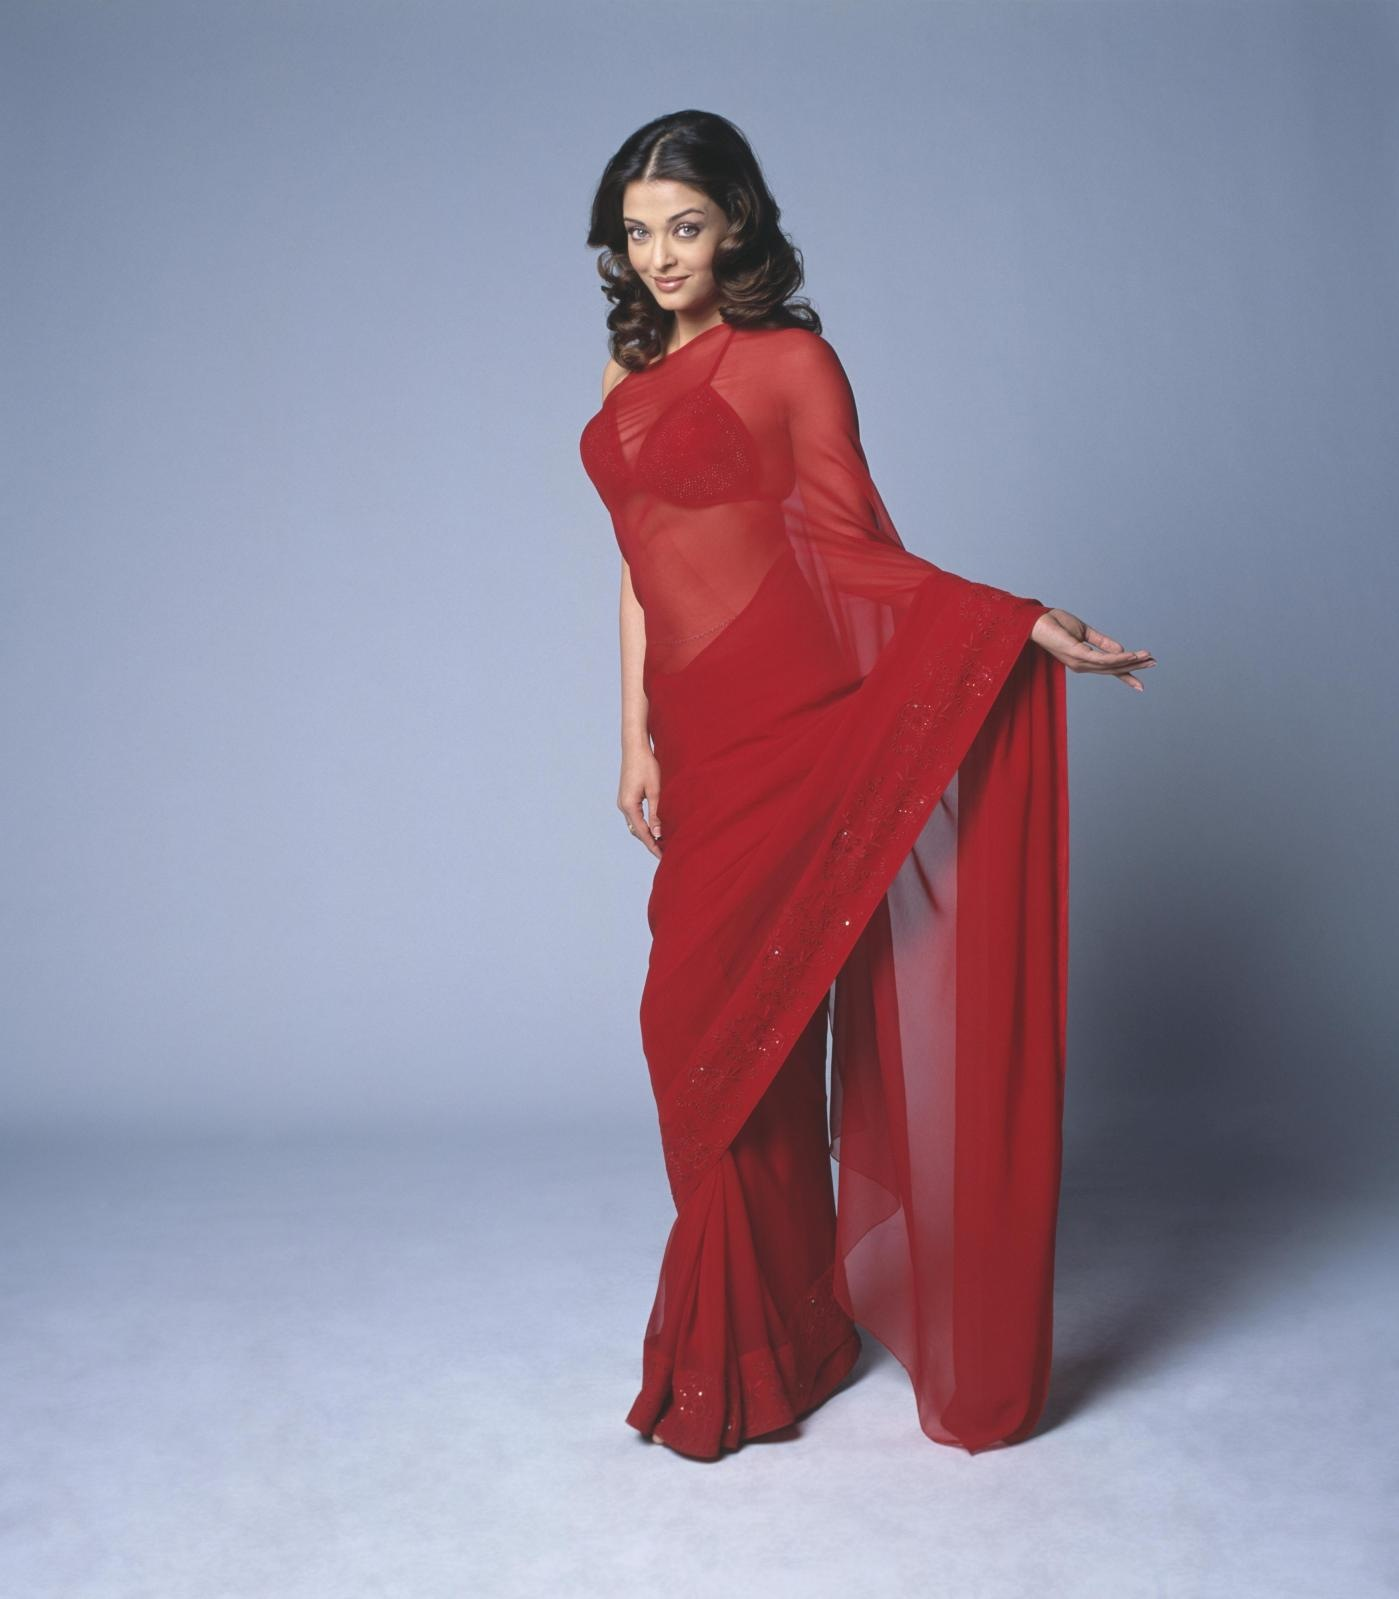 Miss Word Aishwarya Rai